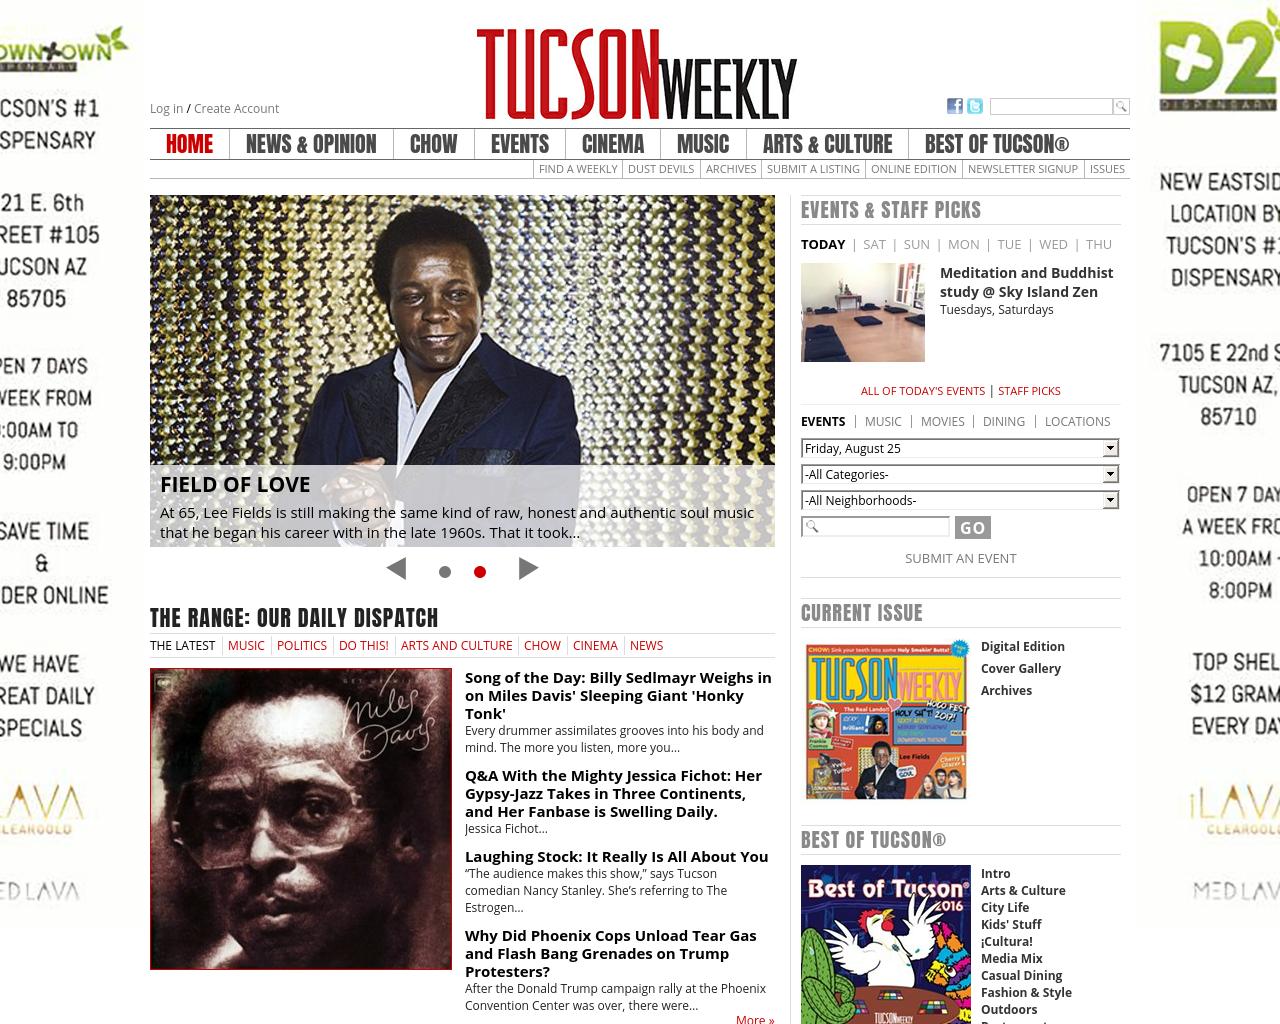 Tucson-Weekly-Advertising-Reviews-Pricing